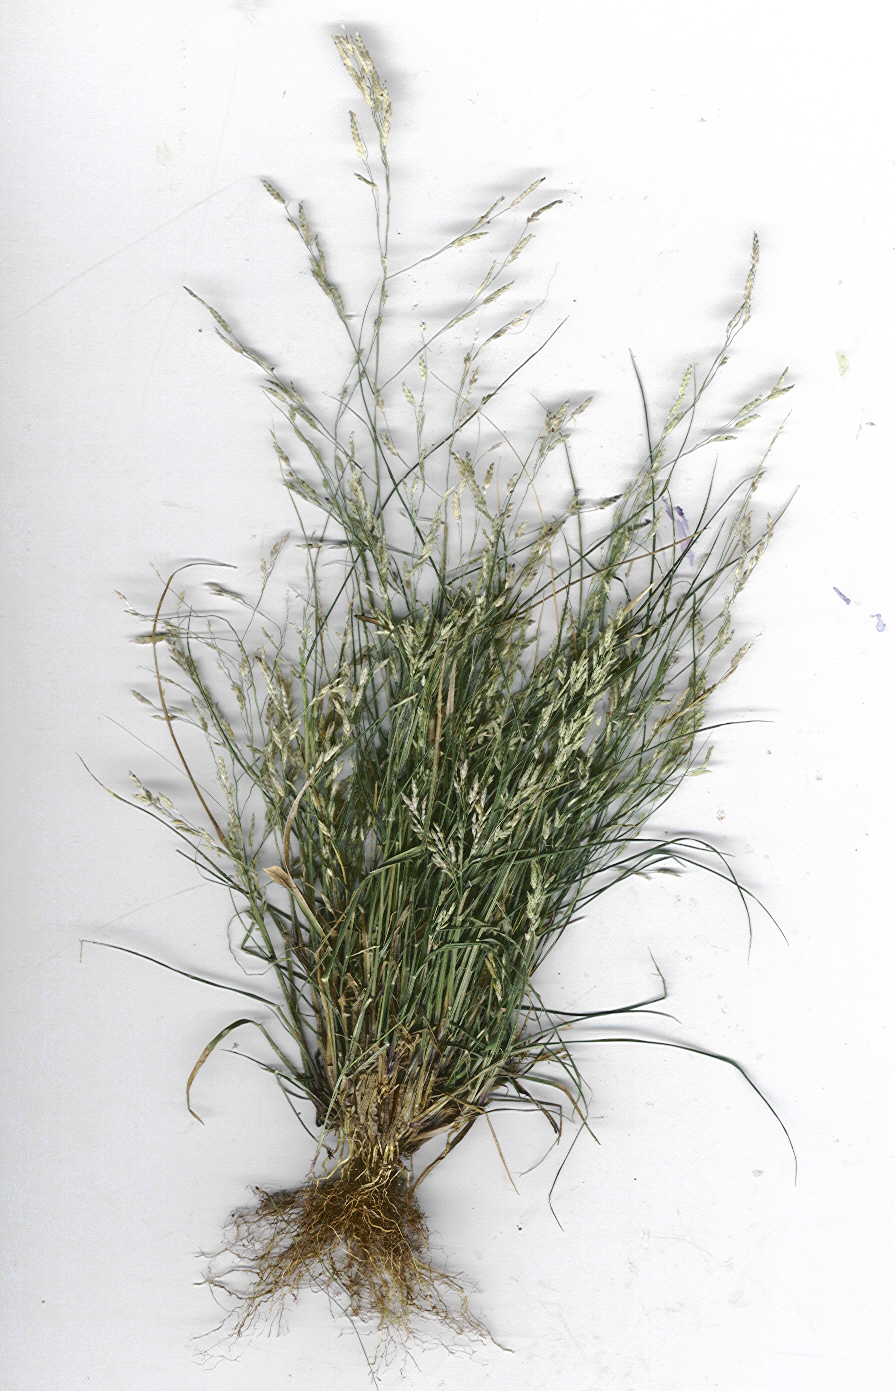 Eragrostis pectinacea - Wikipedia